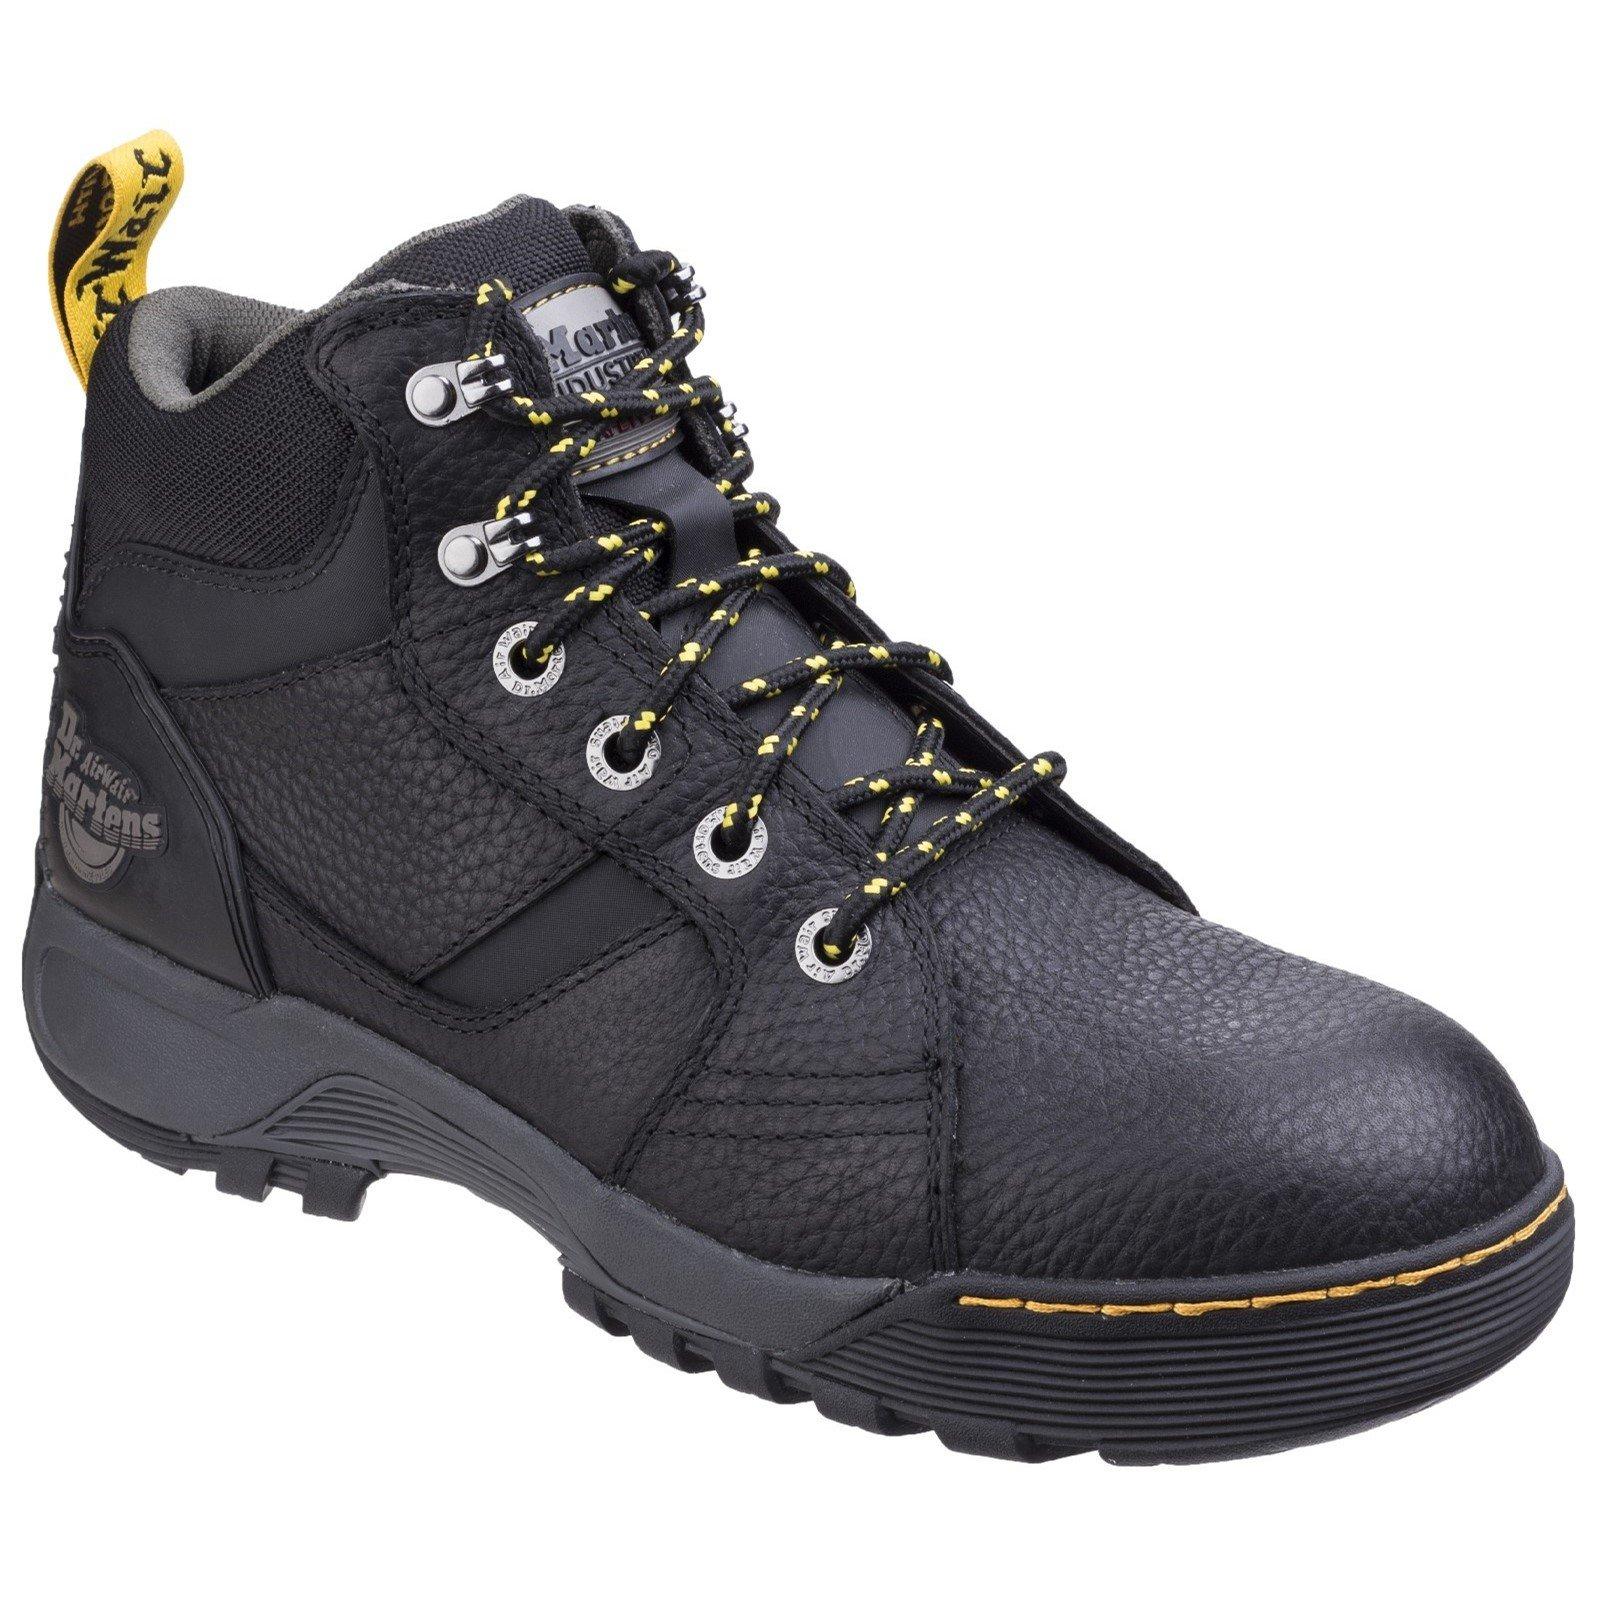 Dr Martens Men's Grapple Safety Boot Various Colours 26023 - Black 4